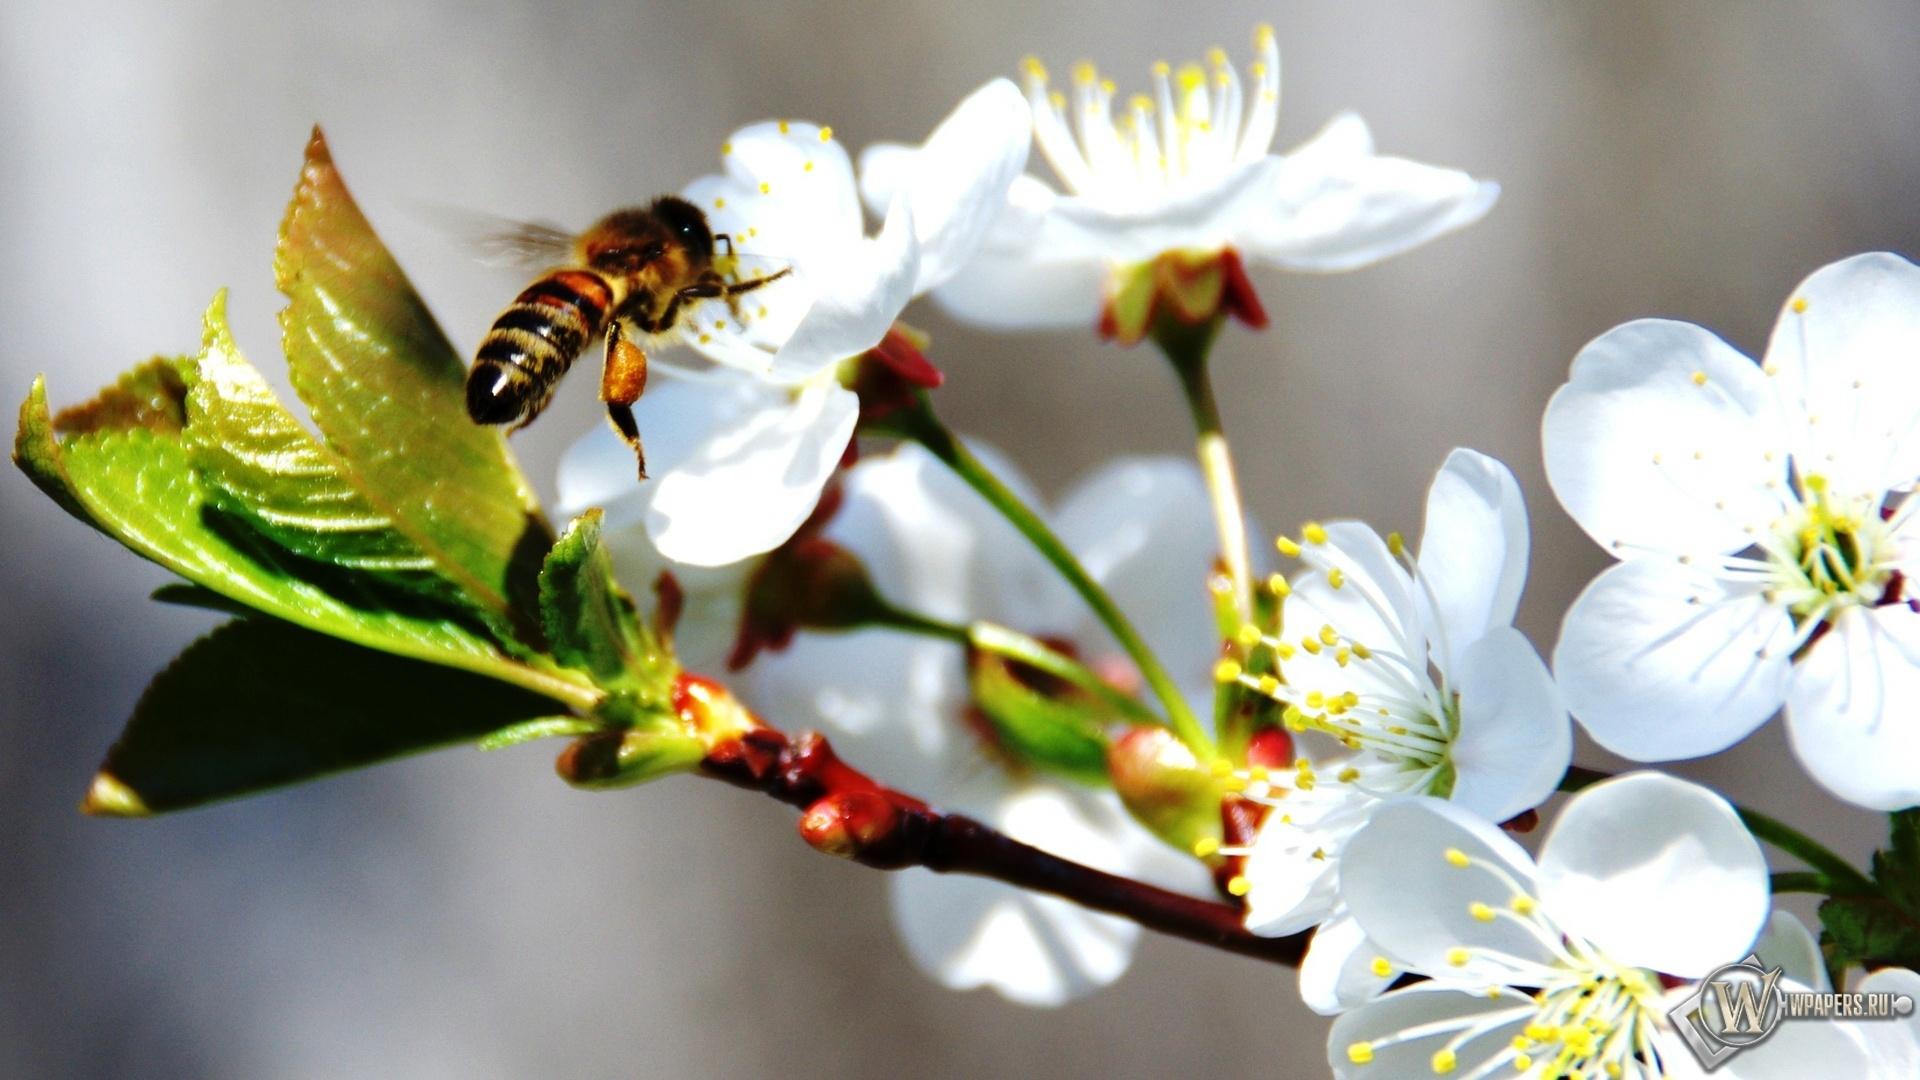 Пчела на черемухе 1920x1080